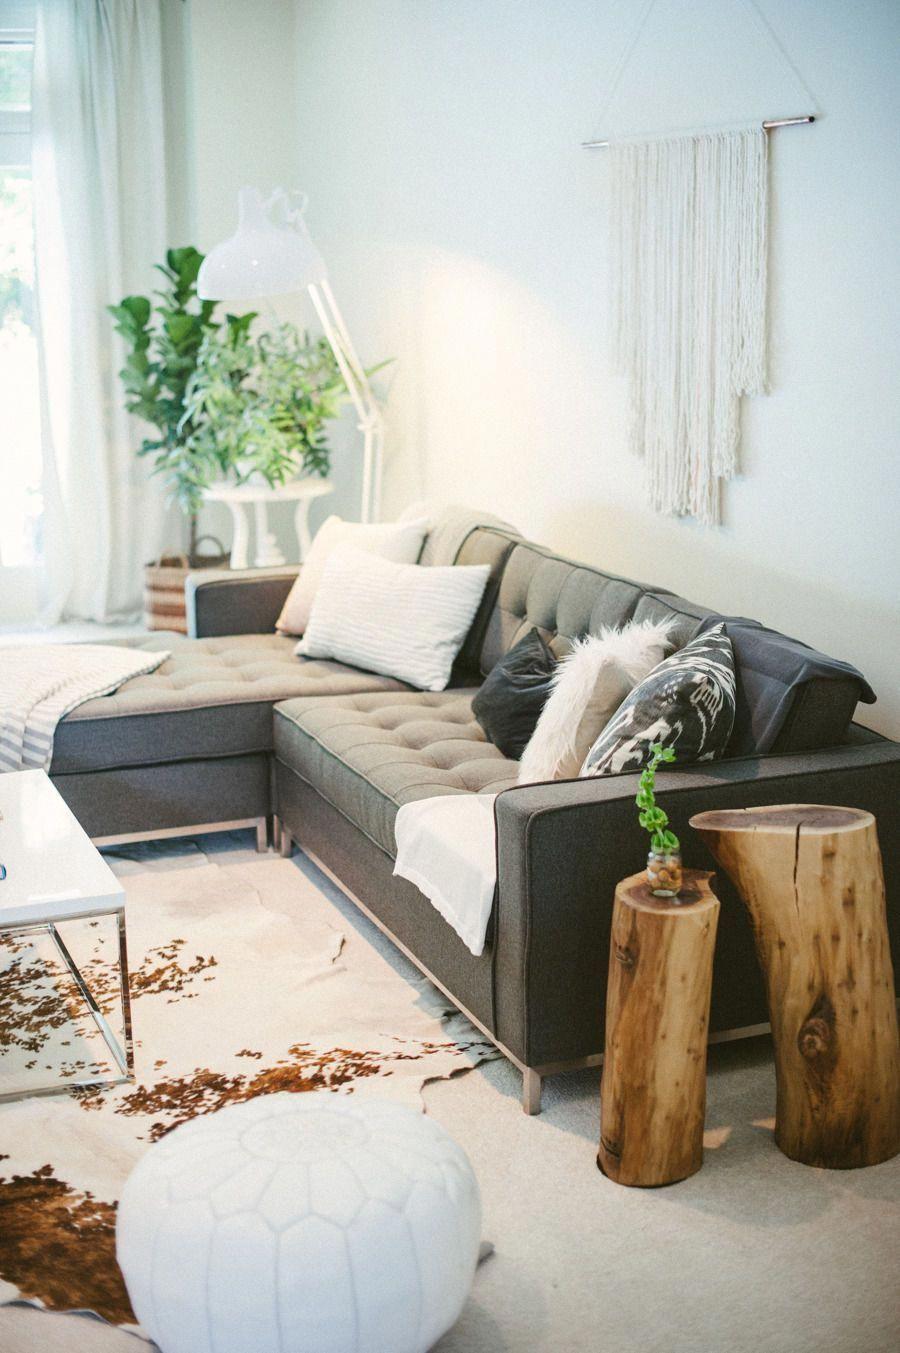 Dark grey living room dark grey sectional  wood stump side tables  small living room